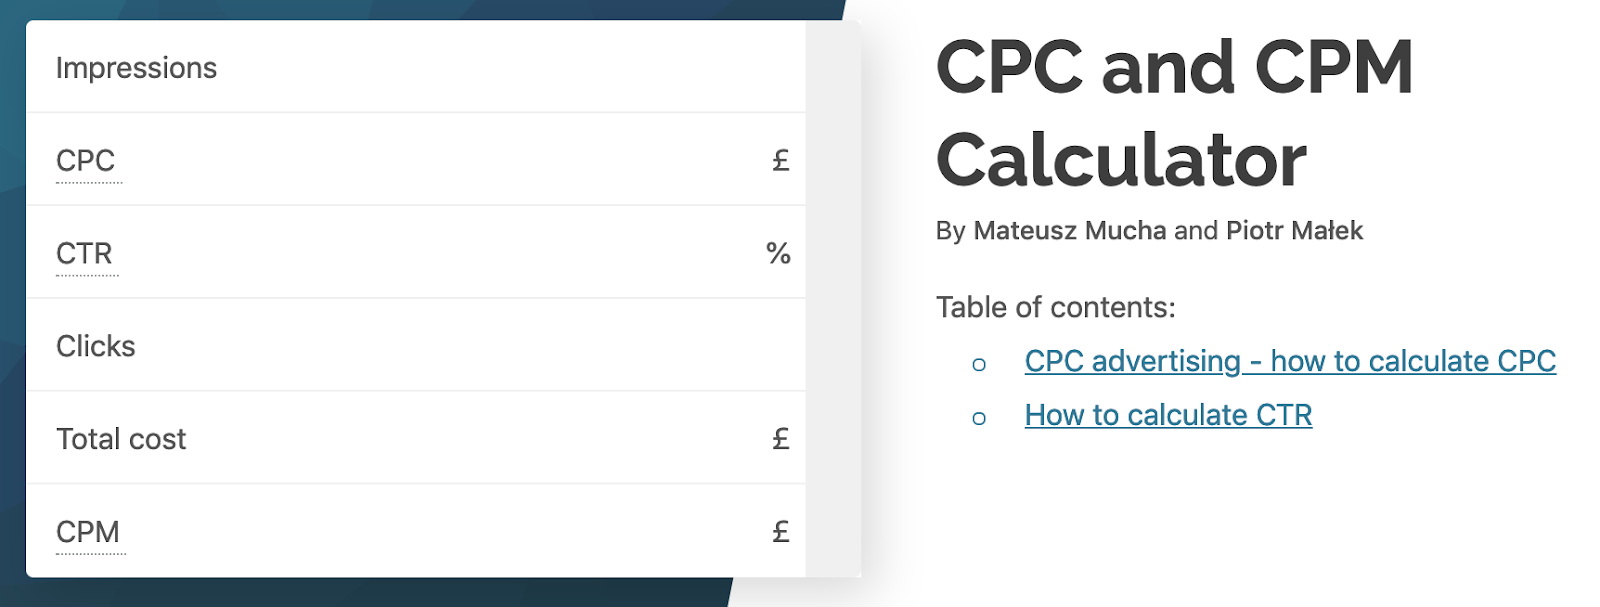 CPC and CPM calculator